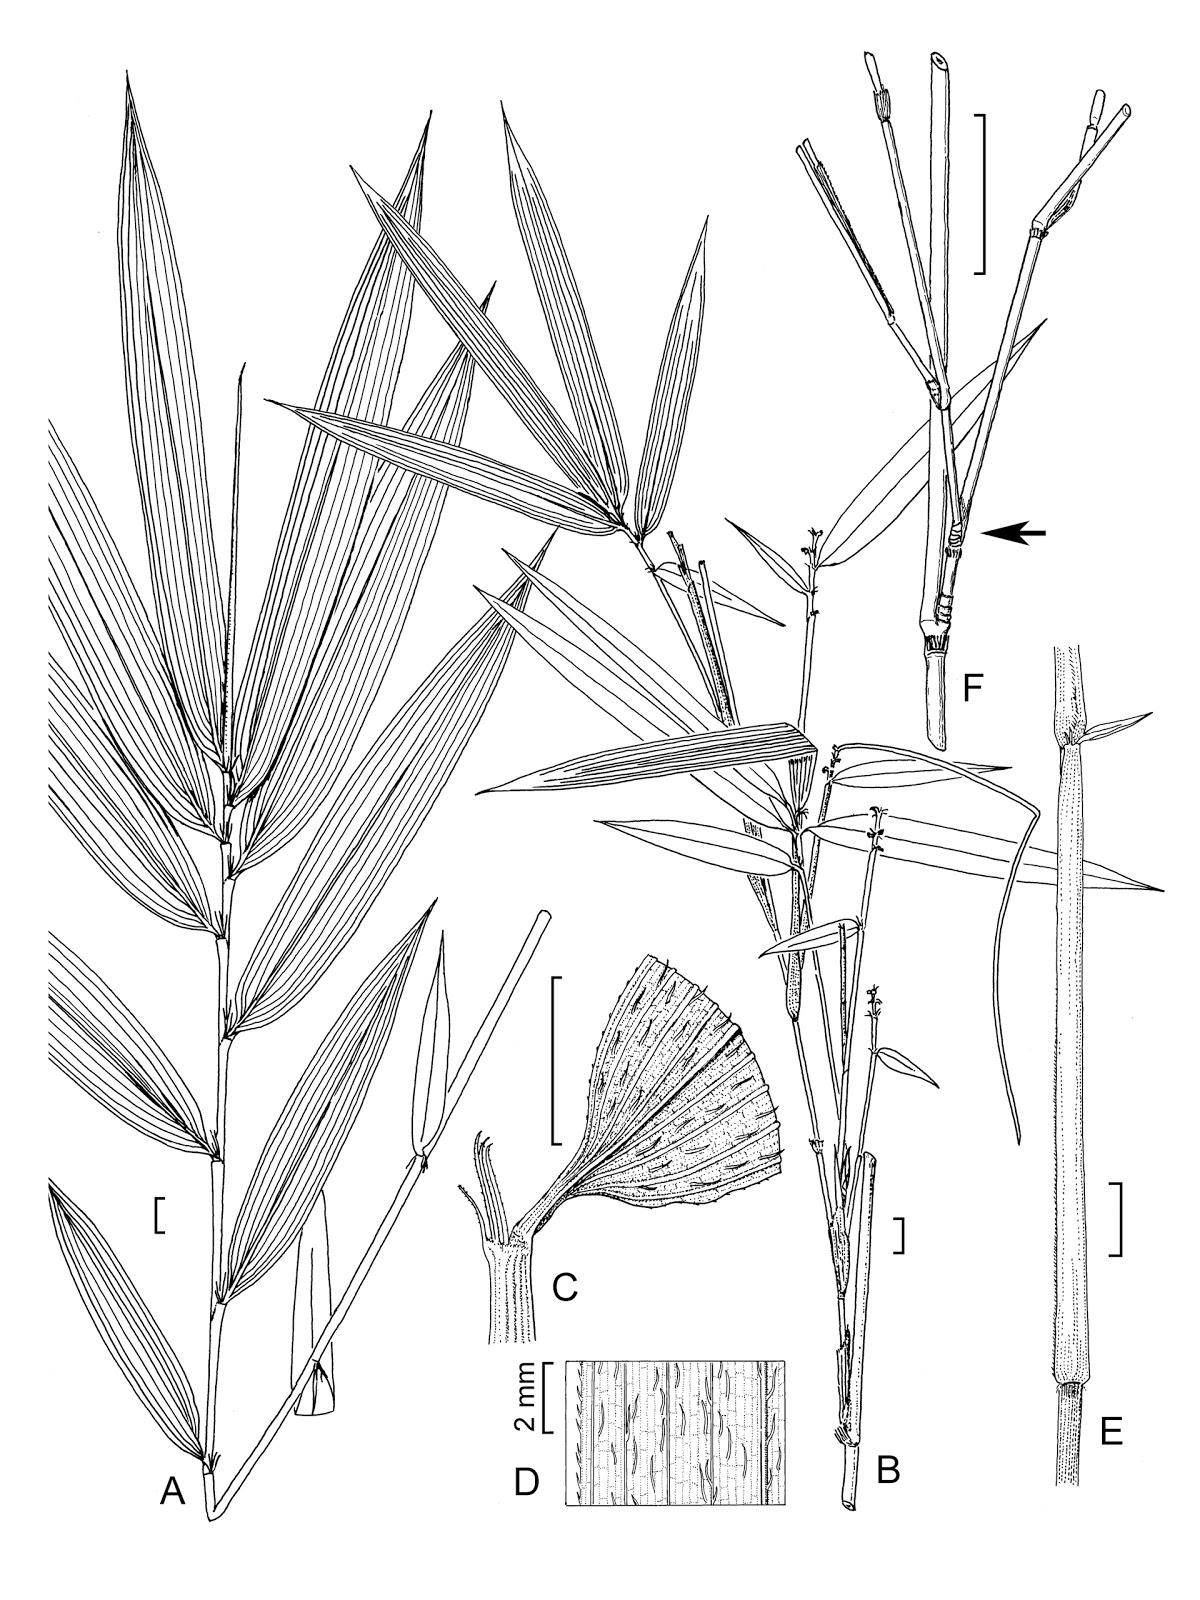 Bamboo Grove Photo Bamboo Drawings